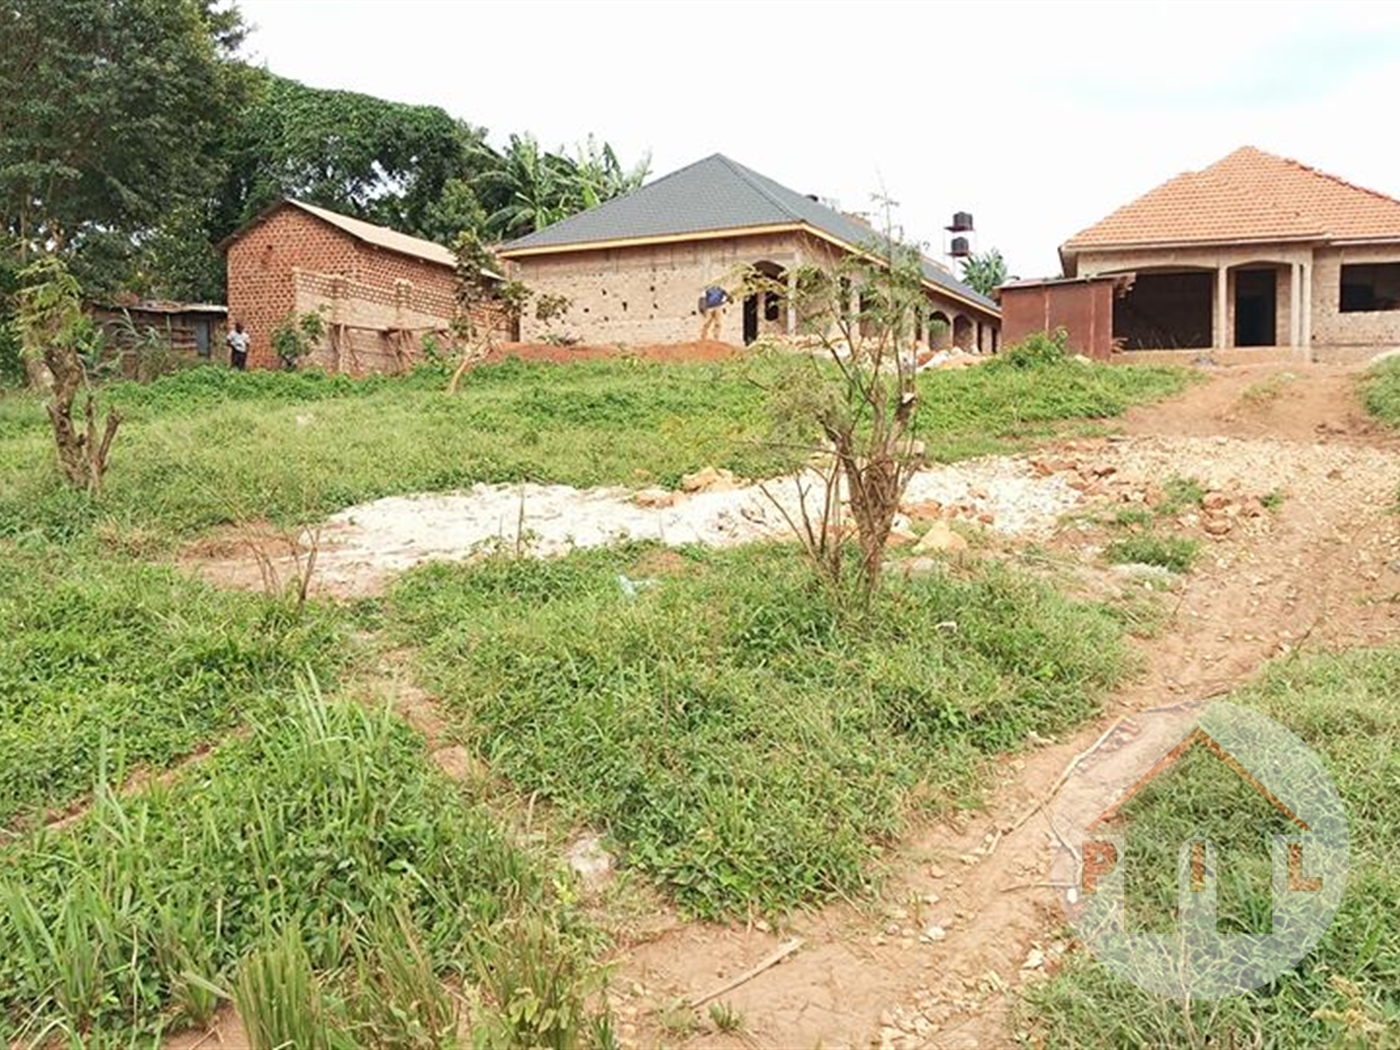 Residential Land for sale in Kyaliwajala Wakiso